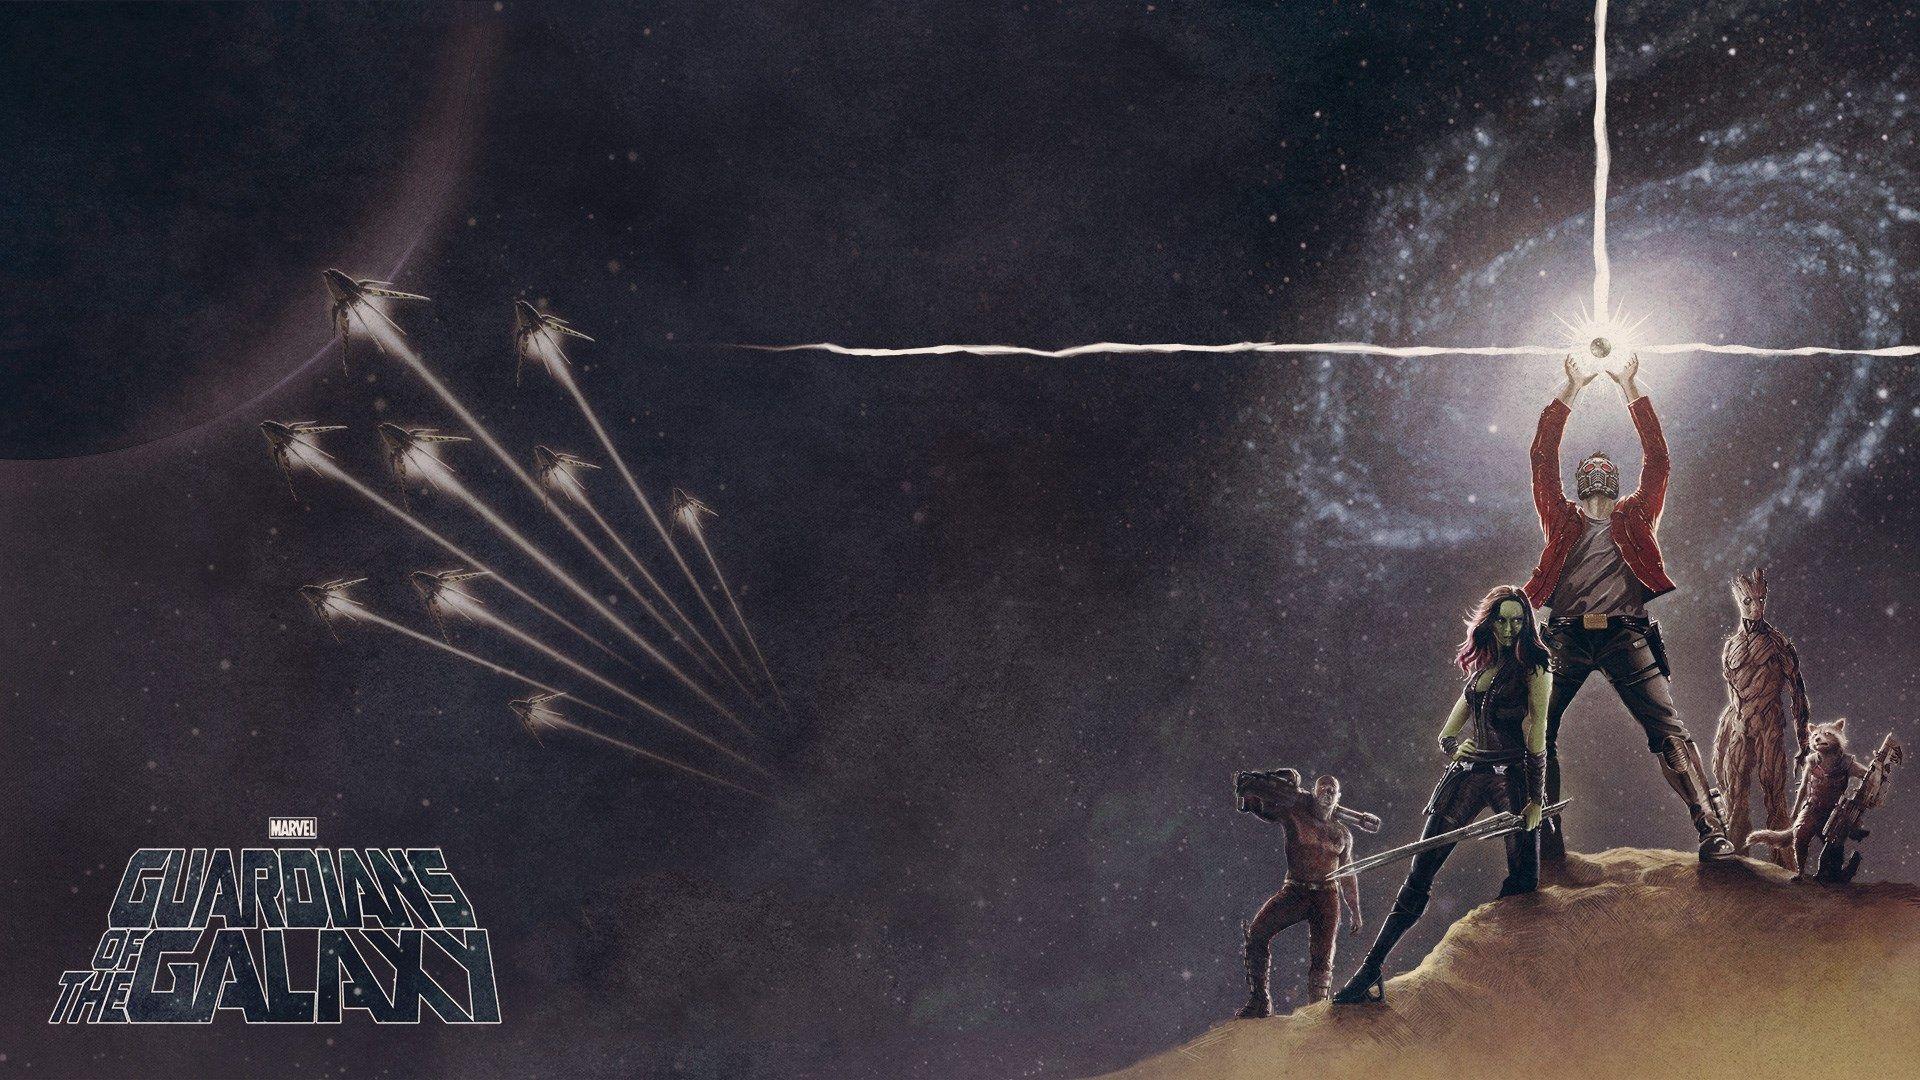 1920x1080 Guardians Of The Galaxy Hd Wallpaper